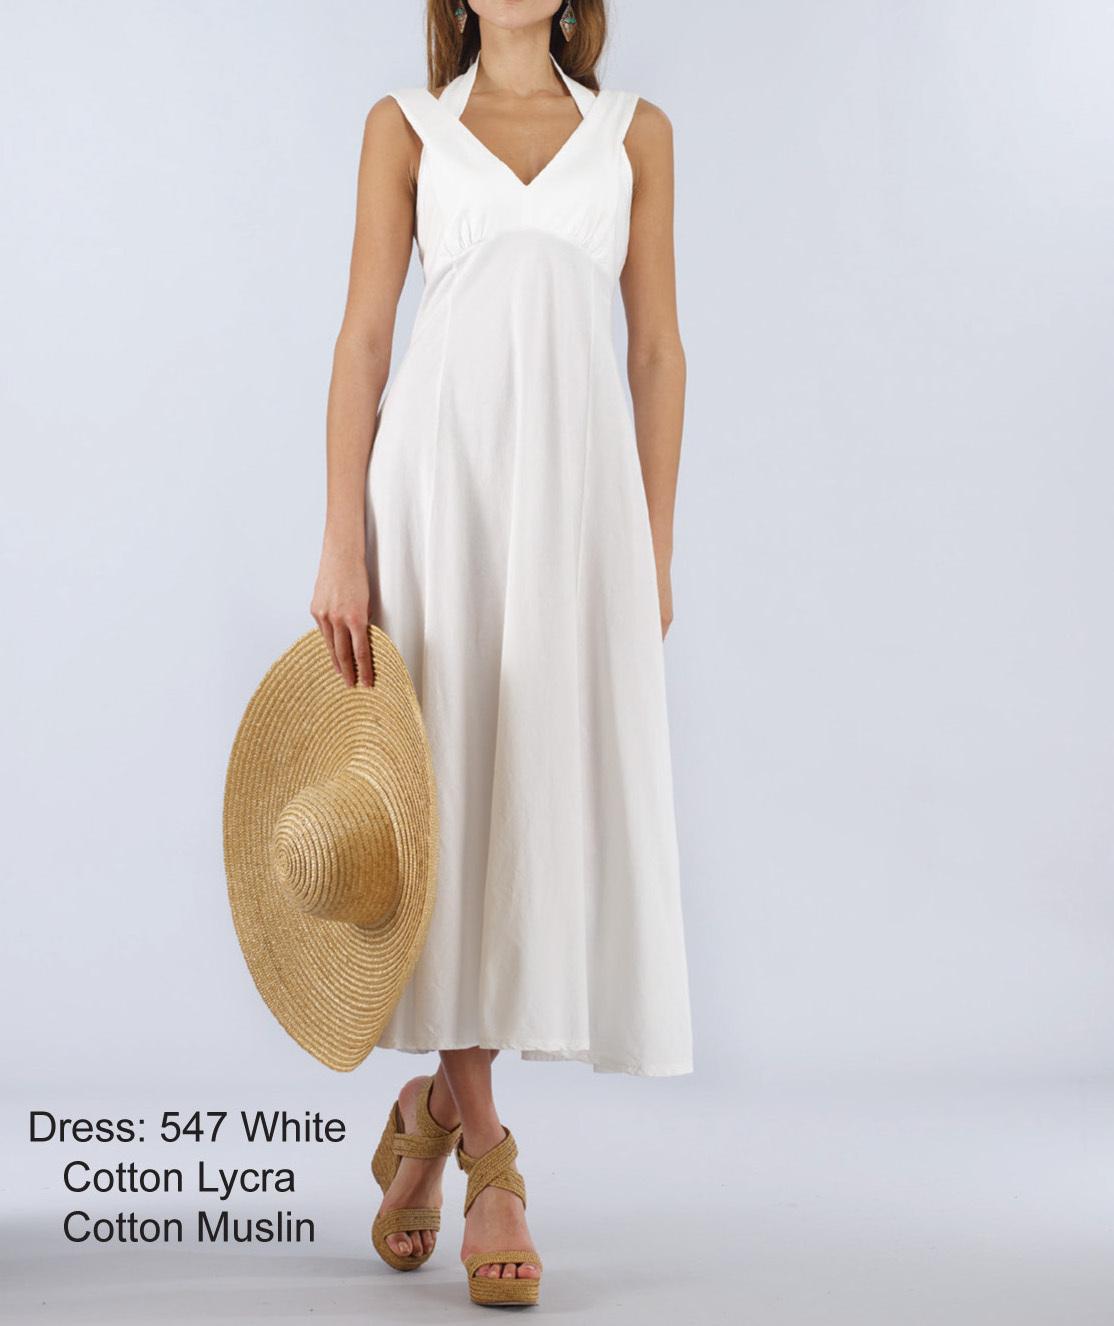 Luna Luz: Diamond Neck Cotton Muslin Dress SOLD OUT LL_547_N